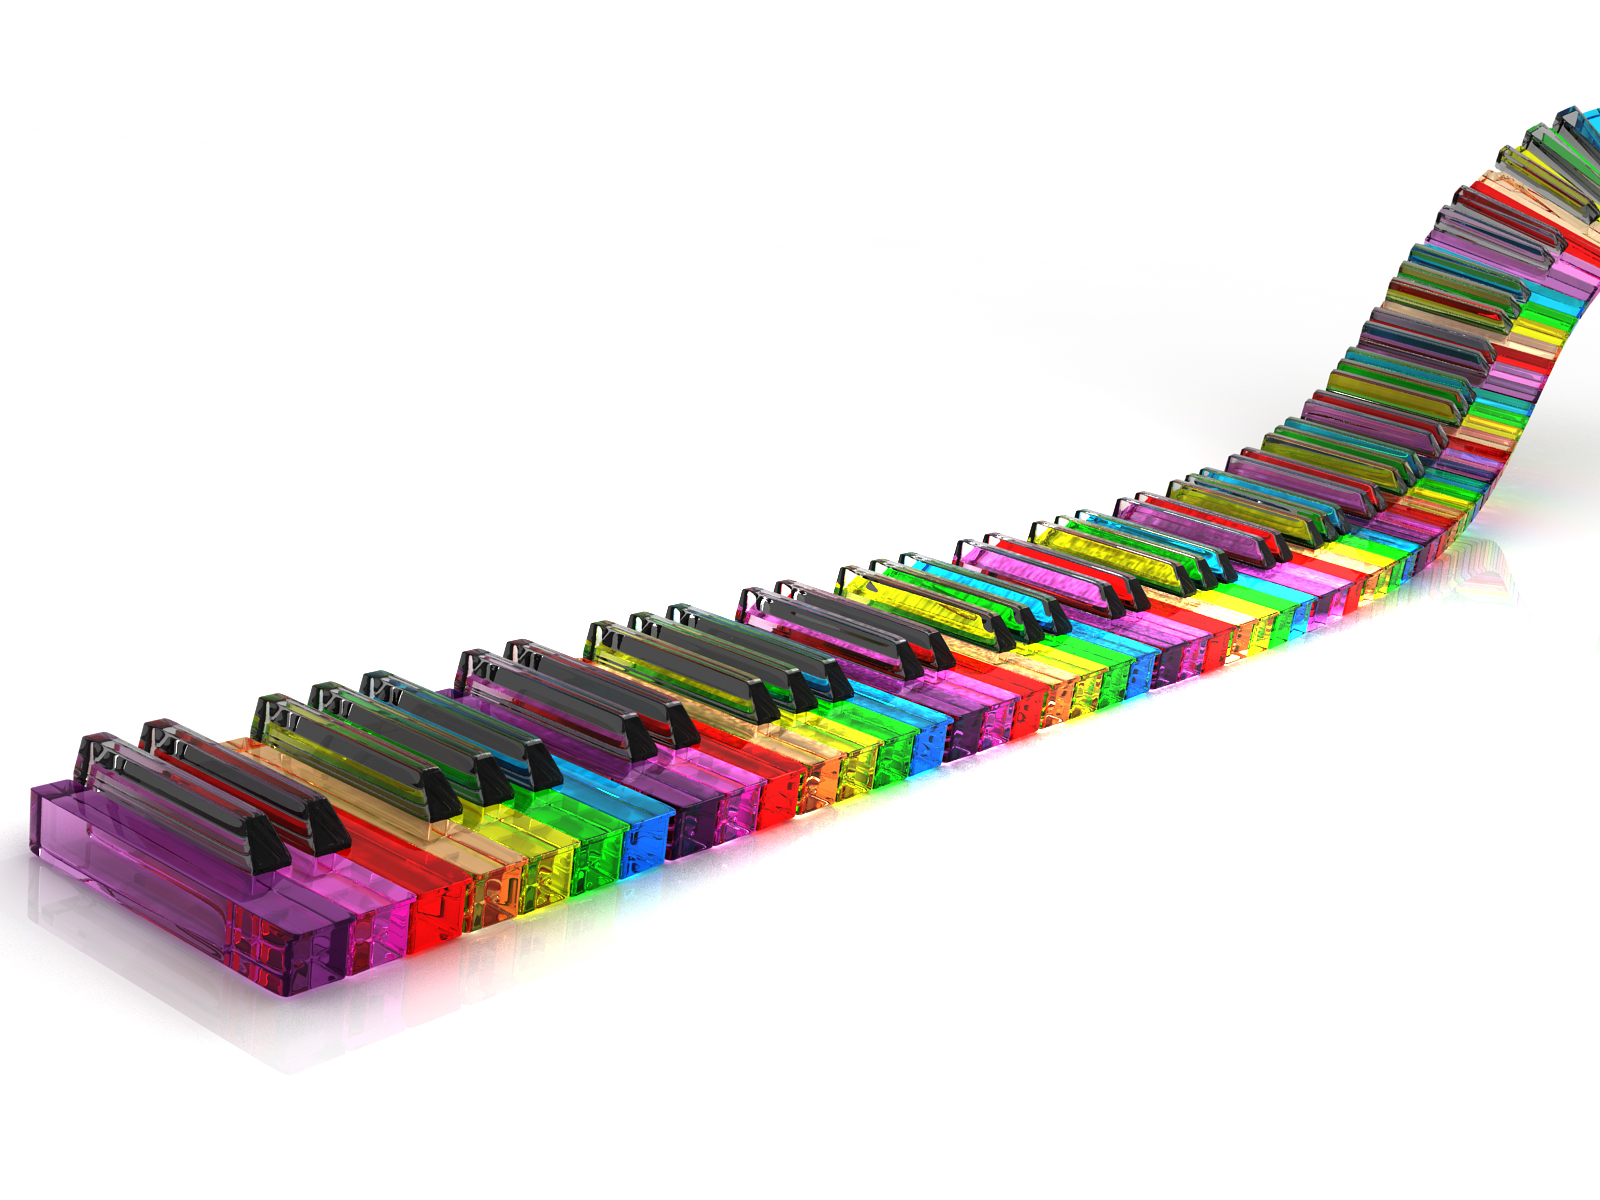 http://4.bp.blogspot.com/-T5b7nWUnXDw/T1BC88NEp1I/AAAAAAAACco/raSy-AvEGnQ/s1600/full-colours-Piano-tuts-glass-wallpapers.jpg